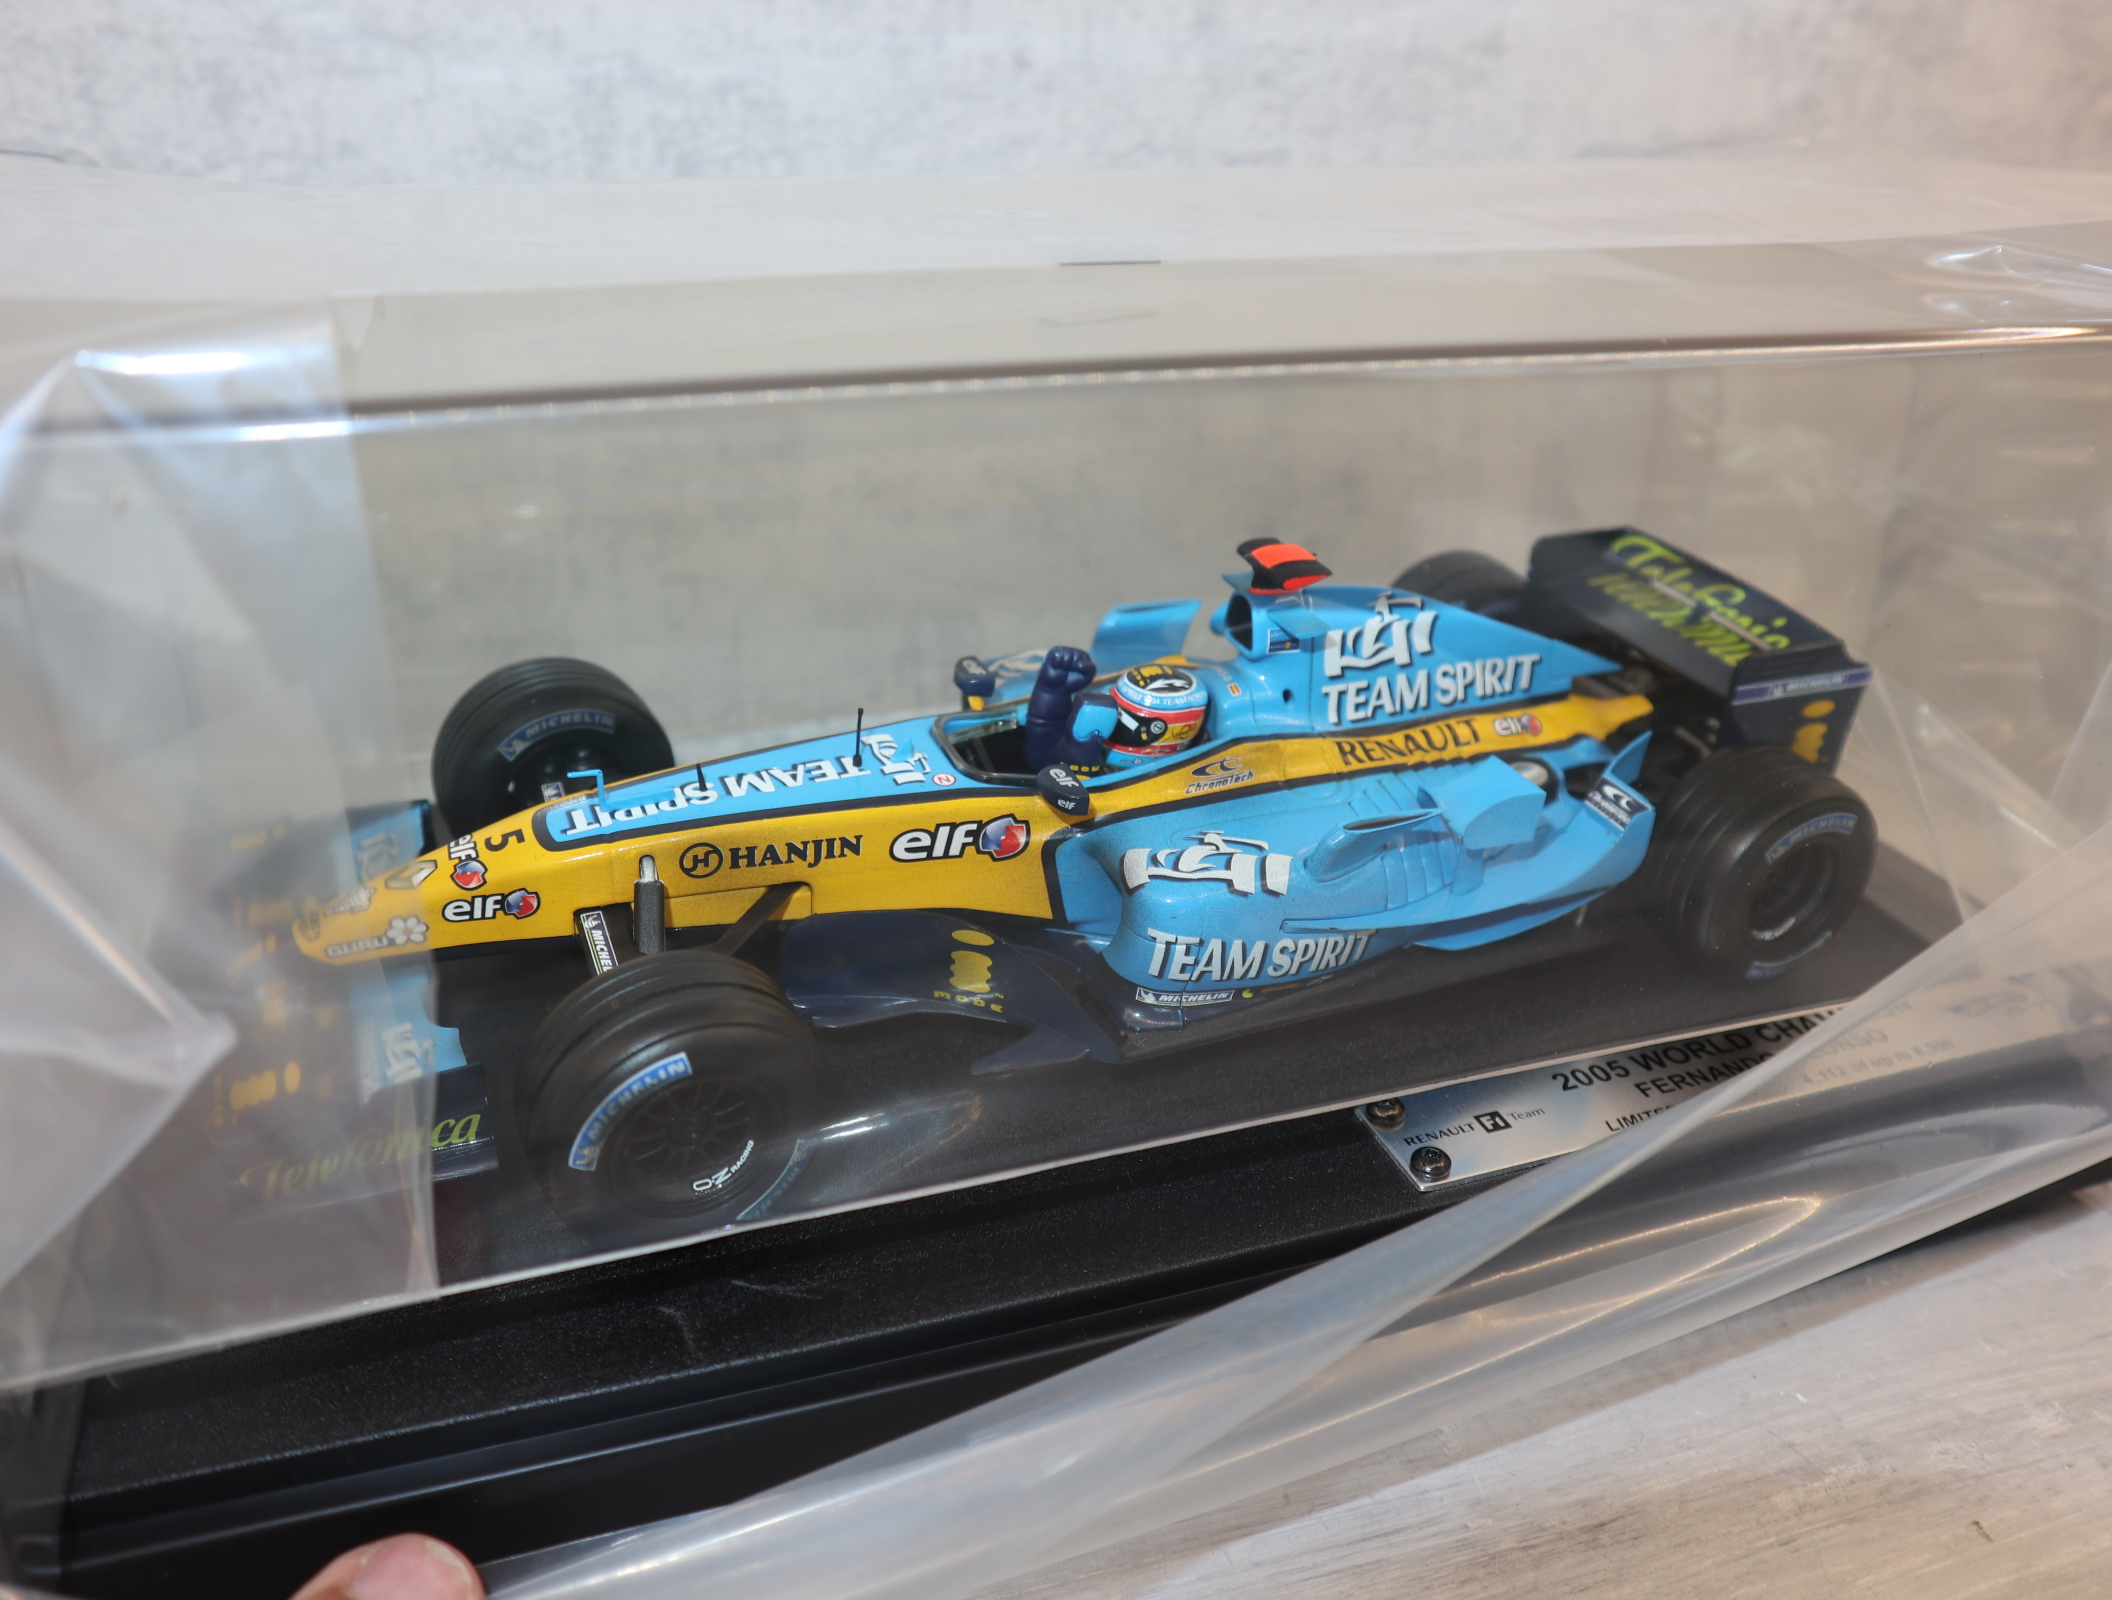 Hot Wheels G9750 1:18 Renault R25 F1 World Champion Fernando Alonso Brazil GP 25.09.2005 komplett in OVP